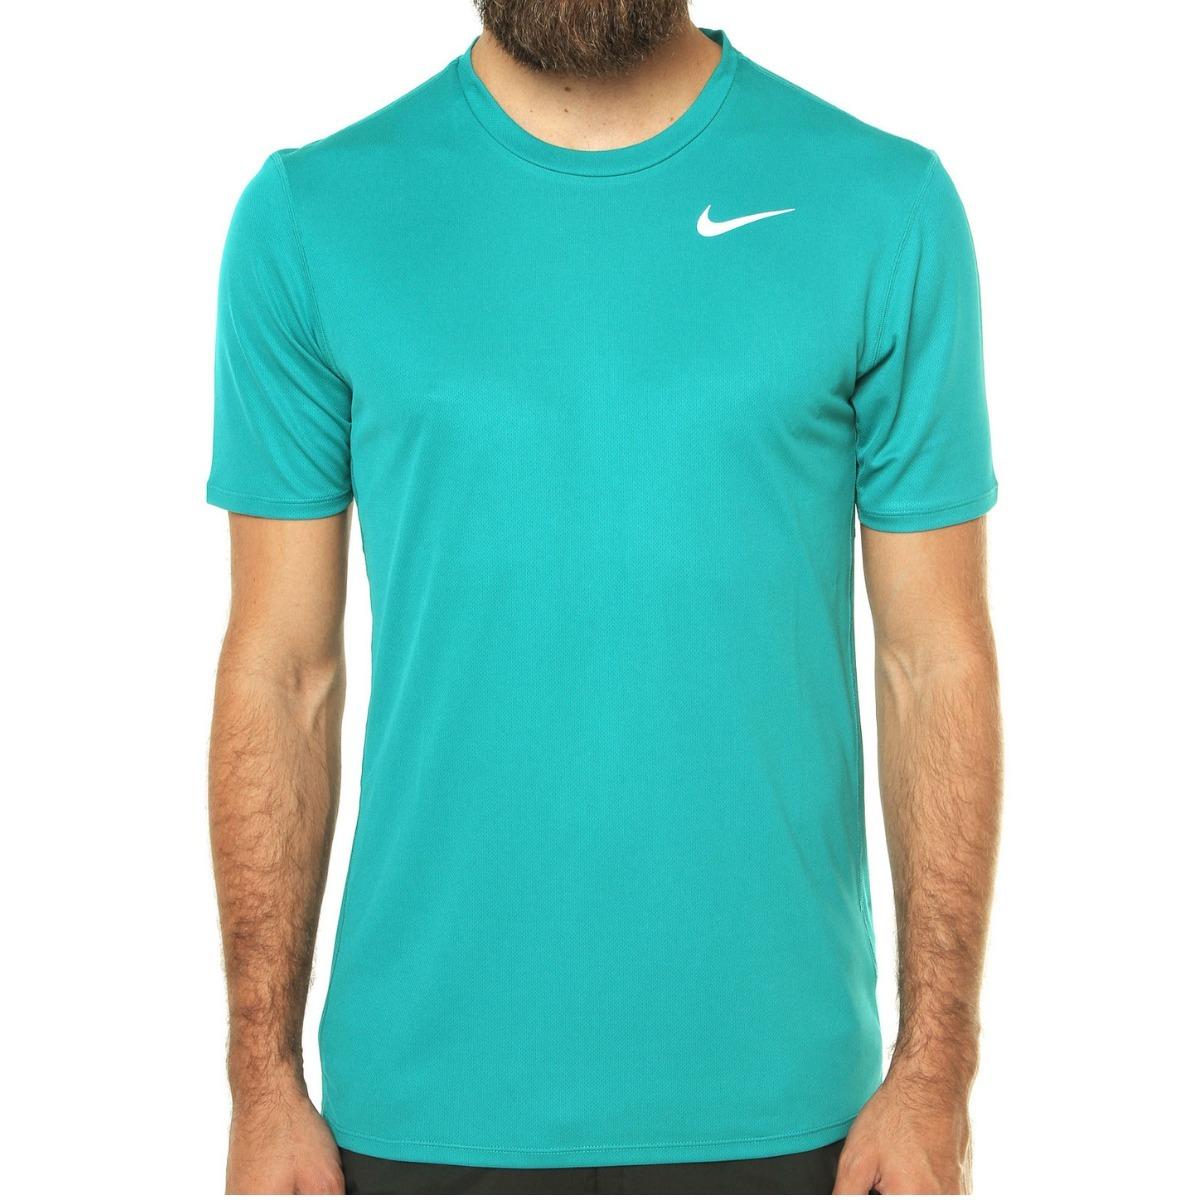 704ec4077d0b3 camiseta nike masculina dri-fit racer - azul claro. Carregando zoom.